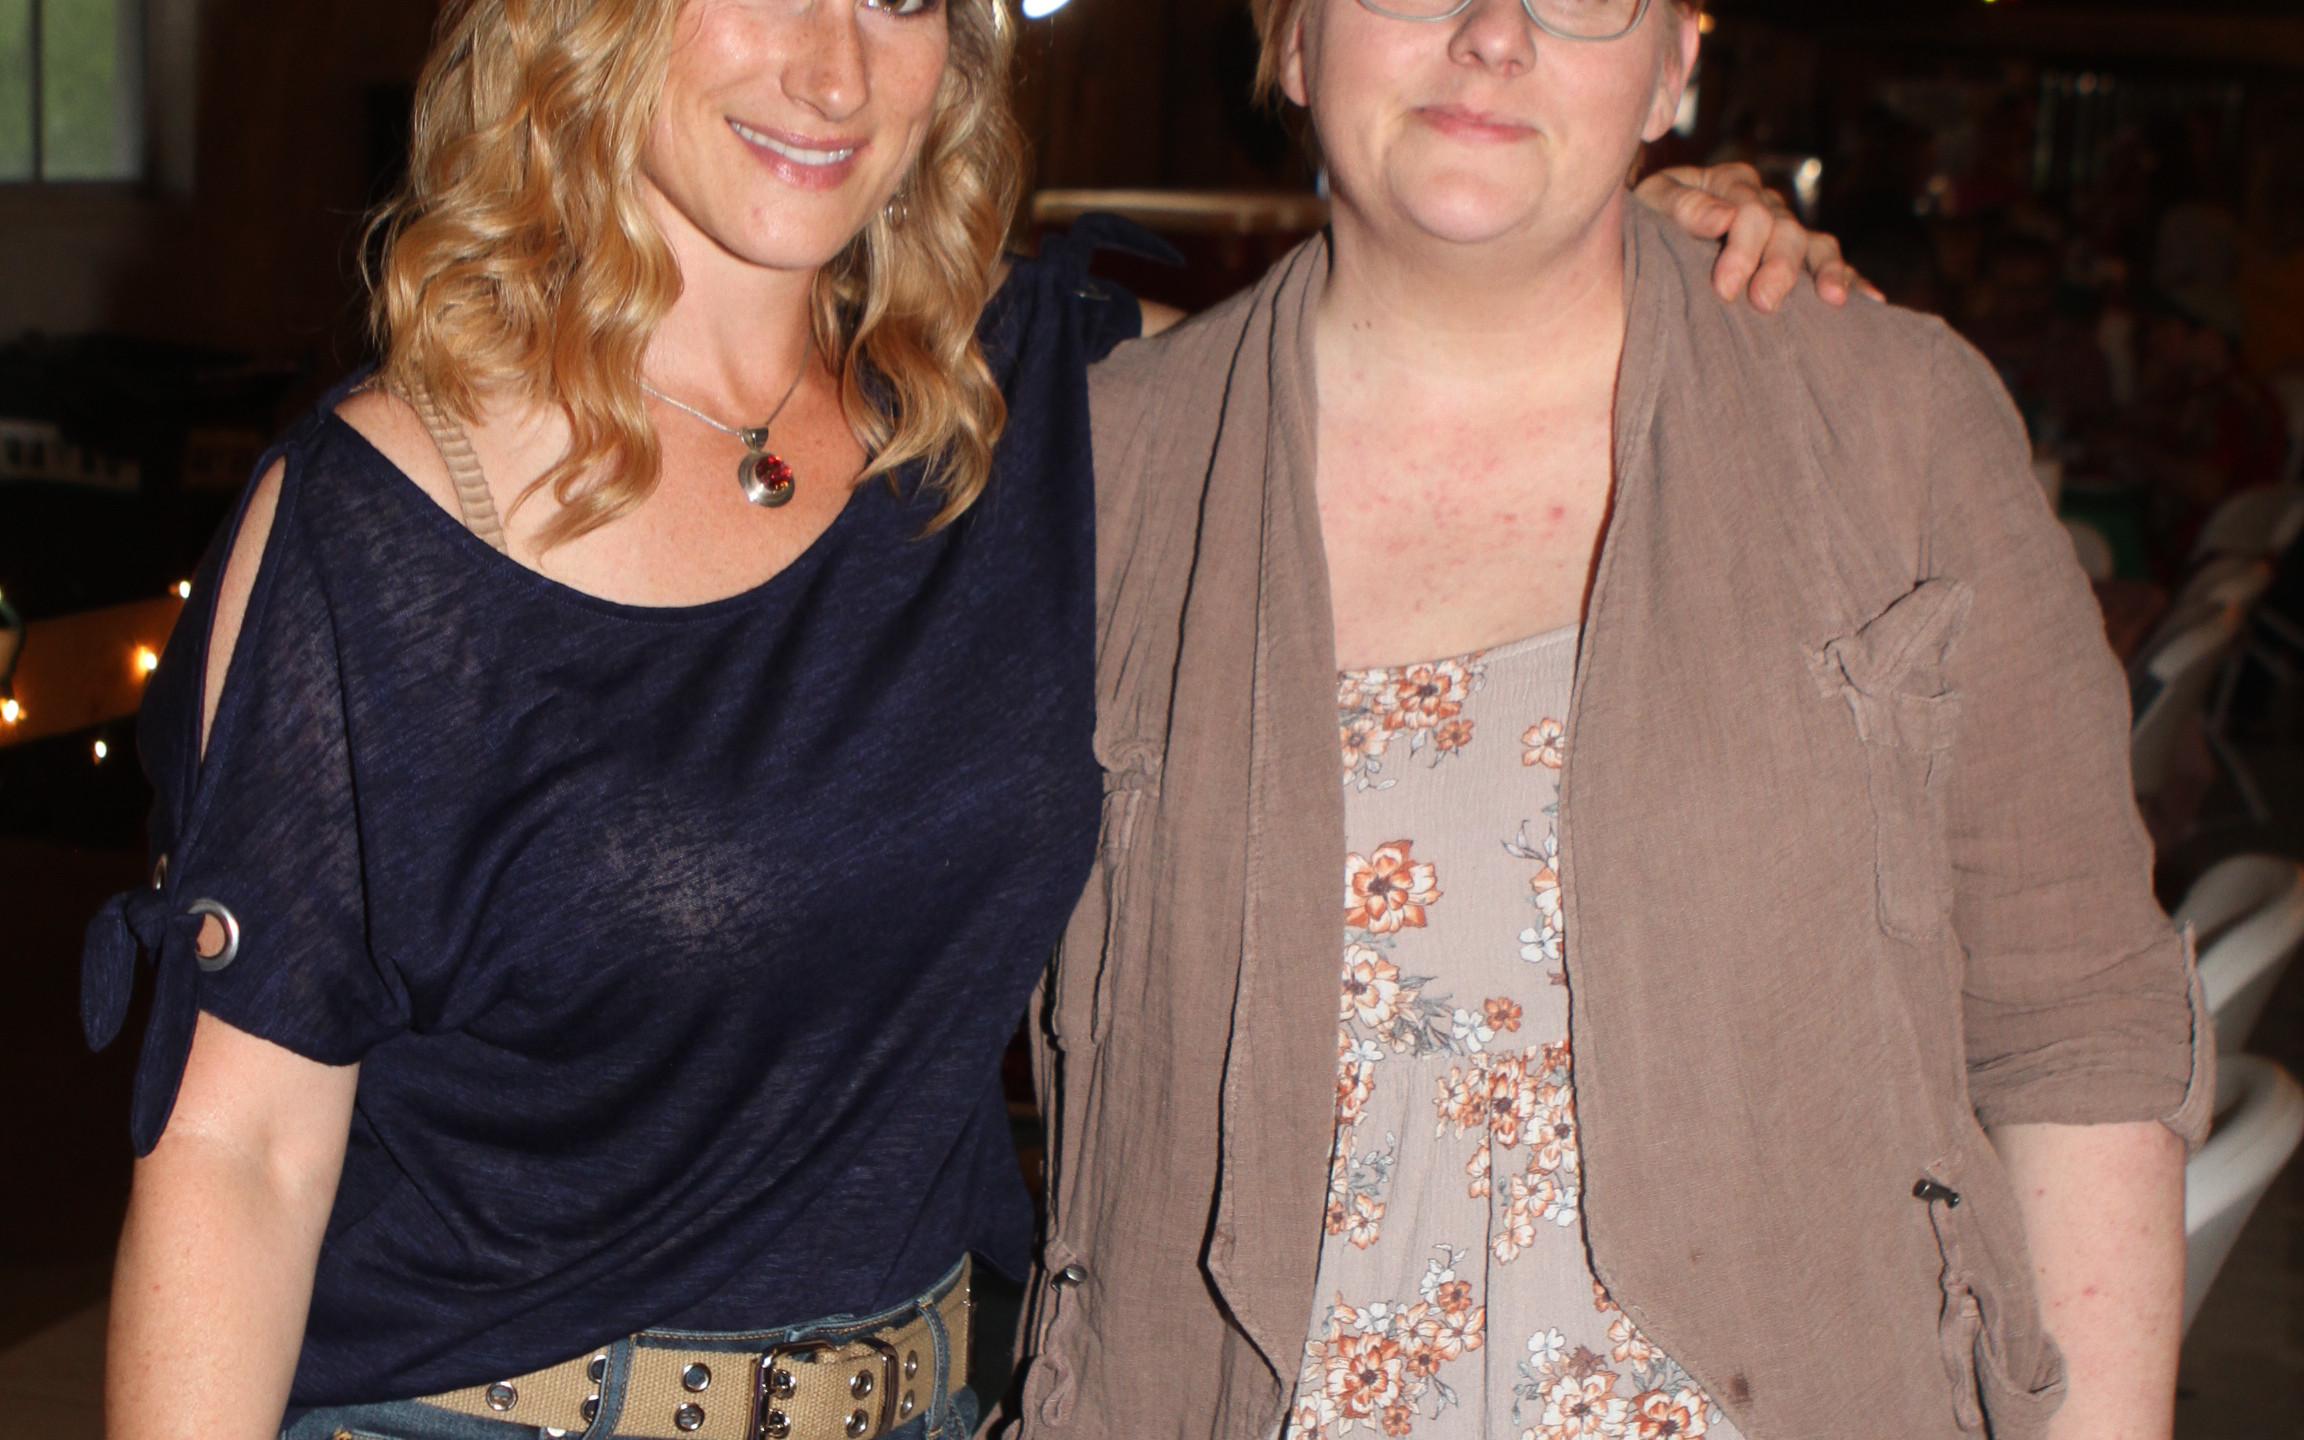 Gretchen Wessels, Sara Tays